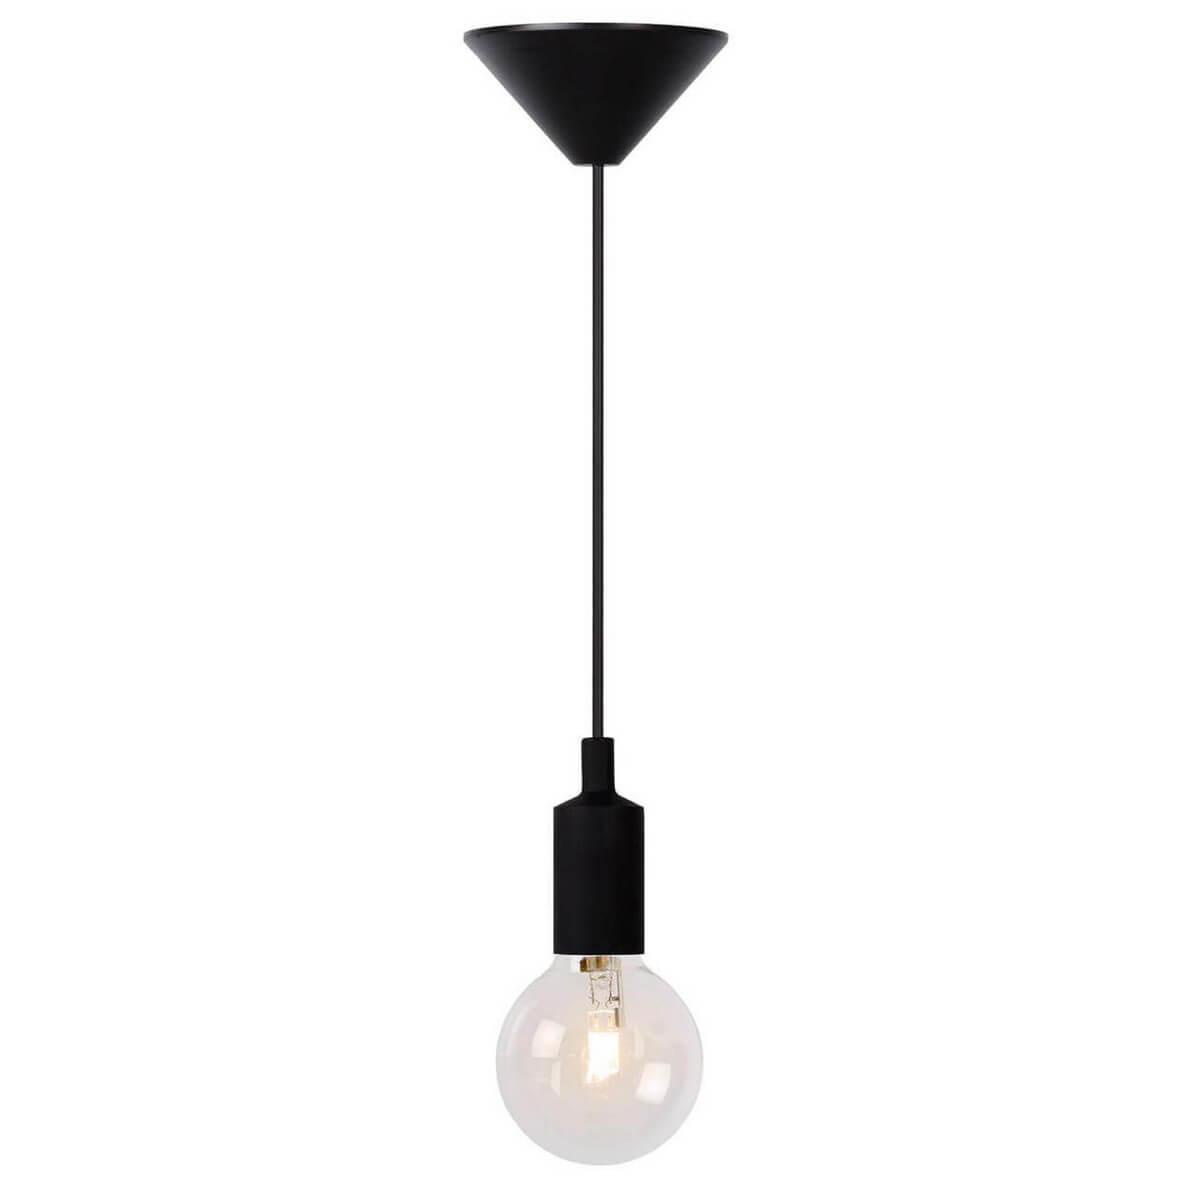 Подвесной светильник Lucide 08408/01/30, E27, 42 Вт lucide подвесной светильник lucide tonga 79459 25 30